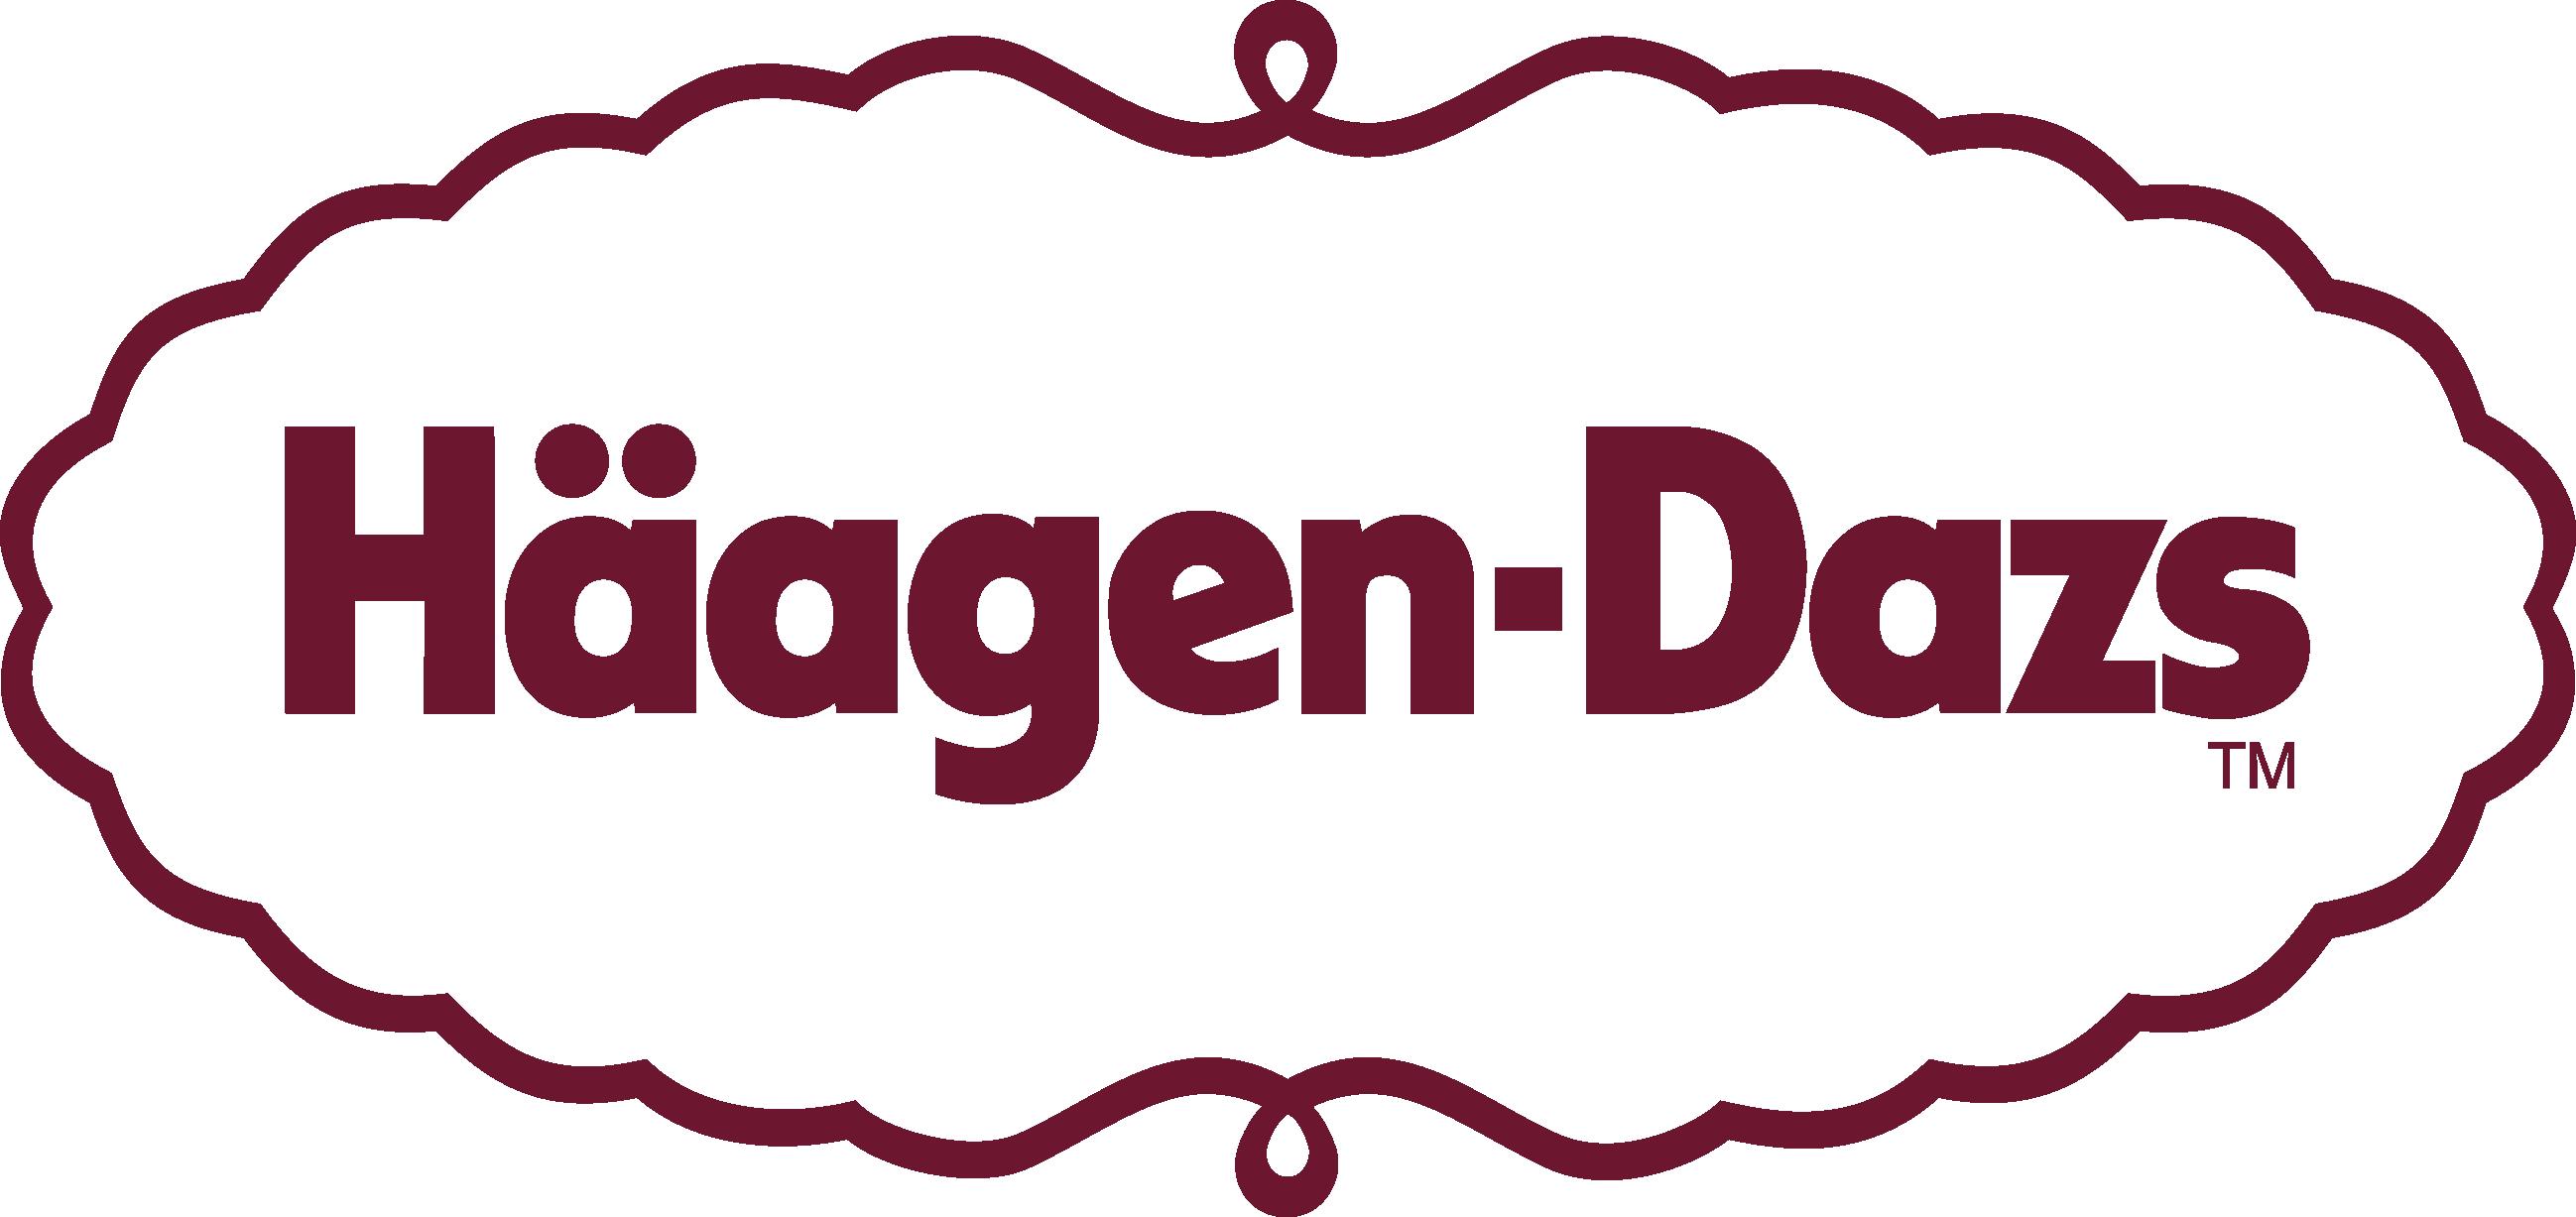 HD logo_dark_red.png